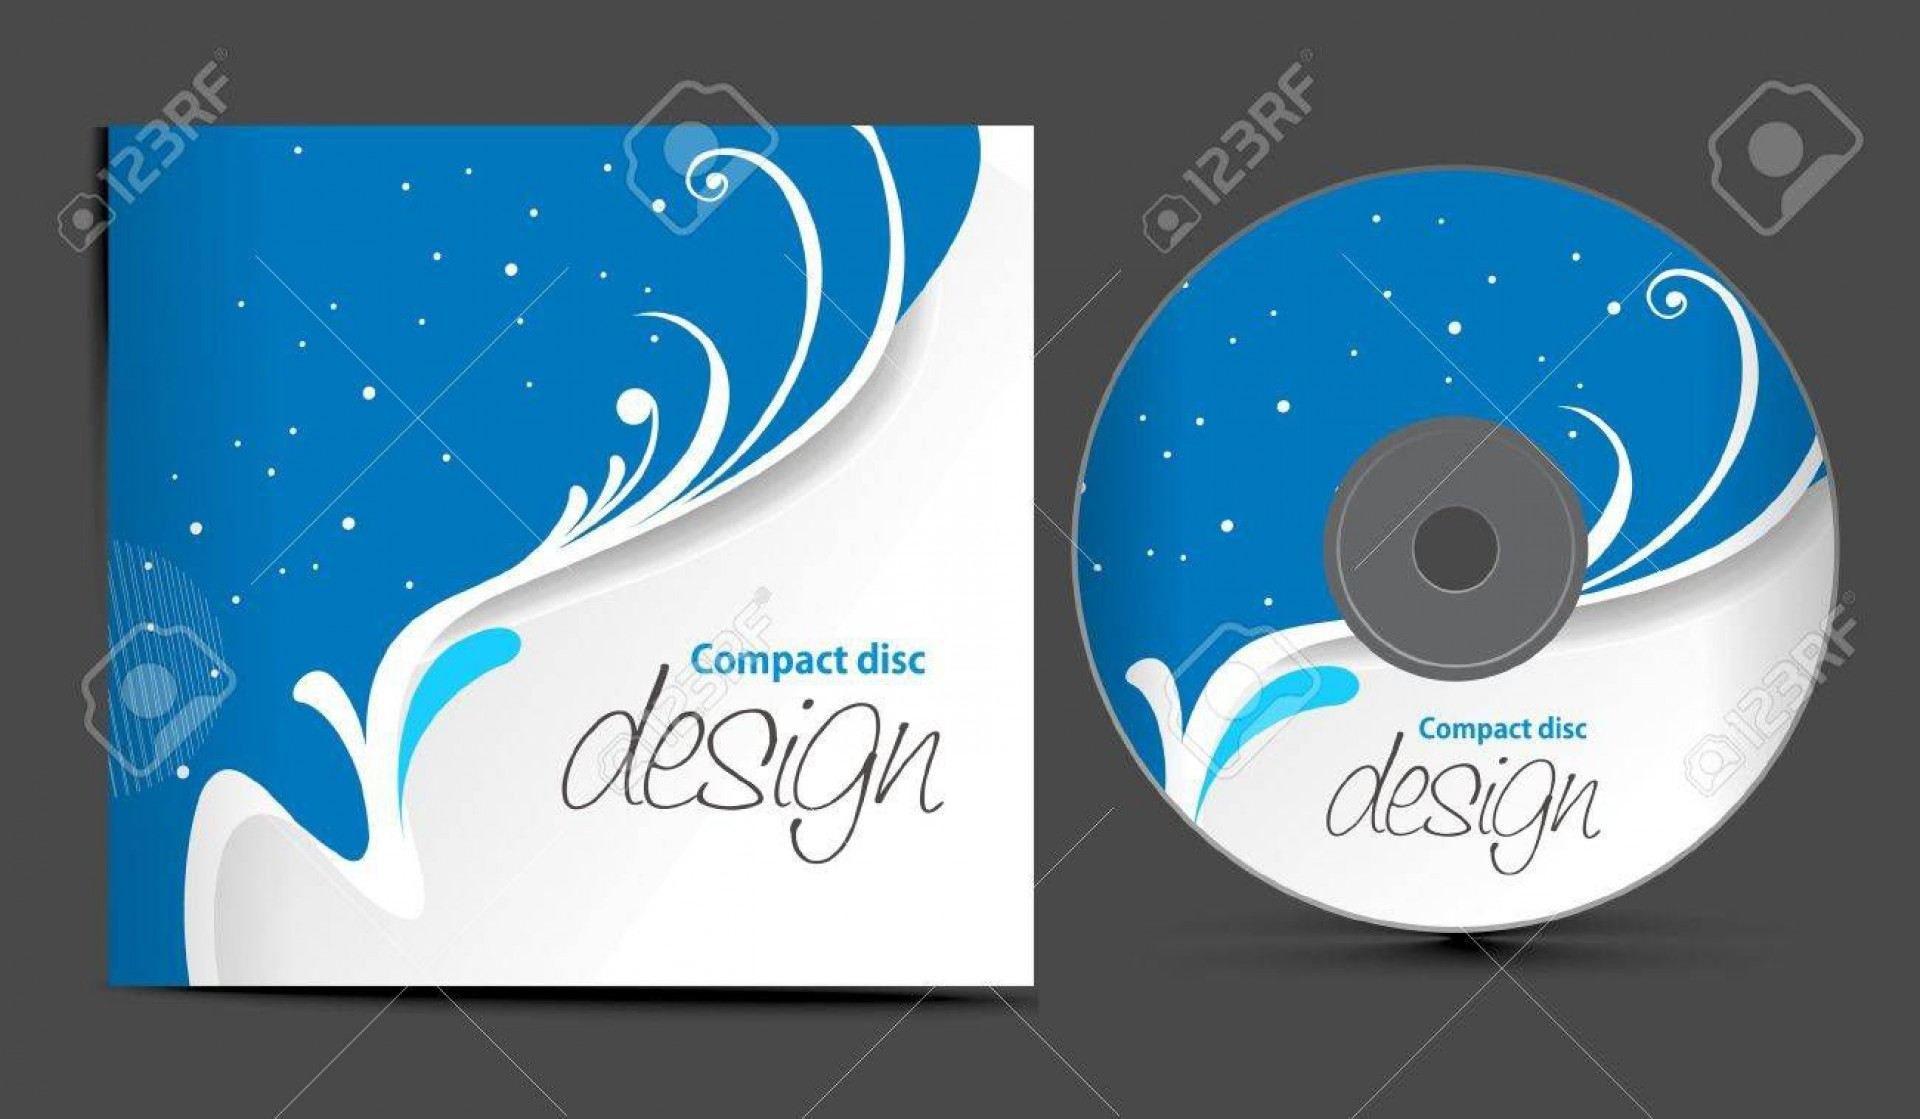 000 Impressive Vector Cd Cover Design Template Free Concept 1920